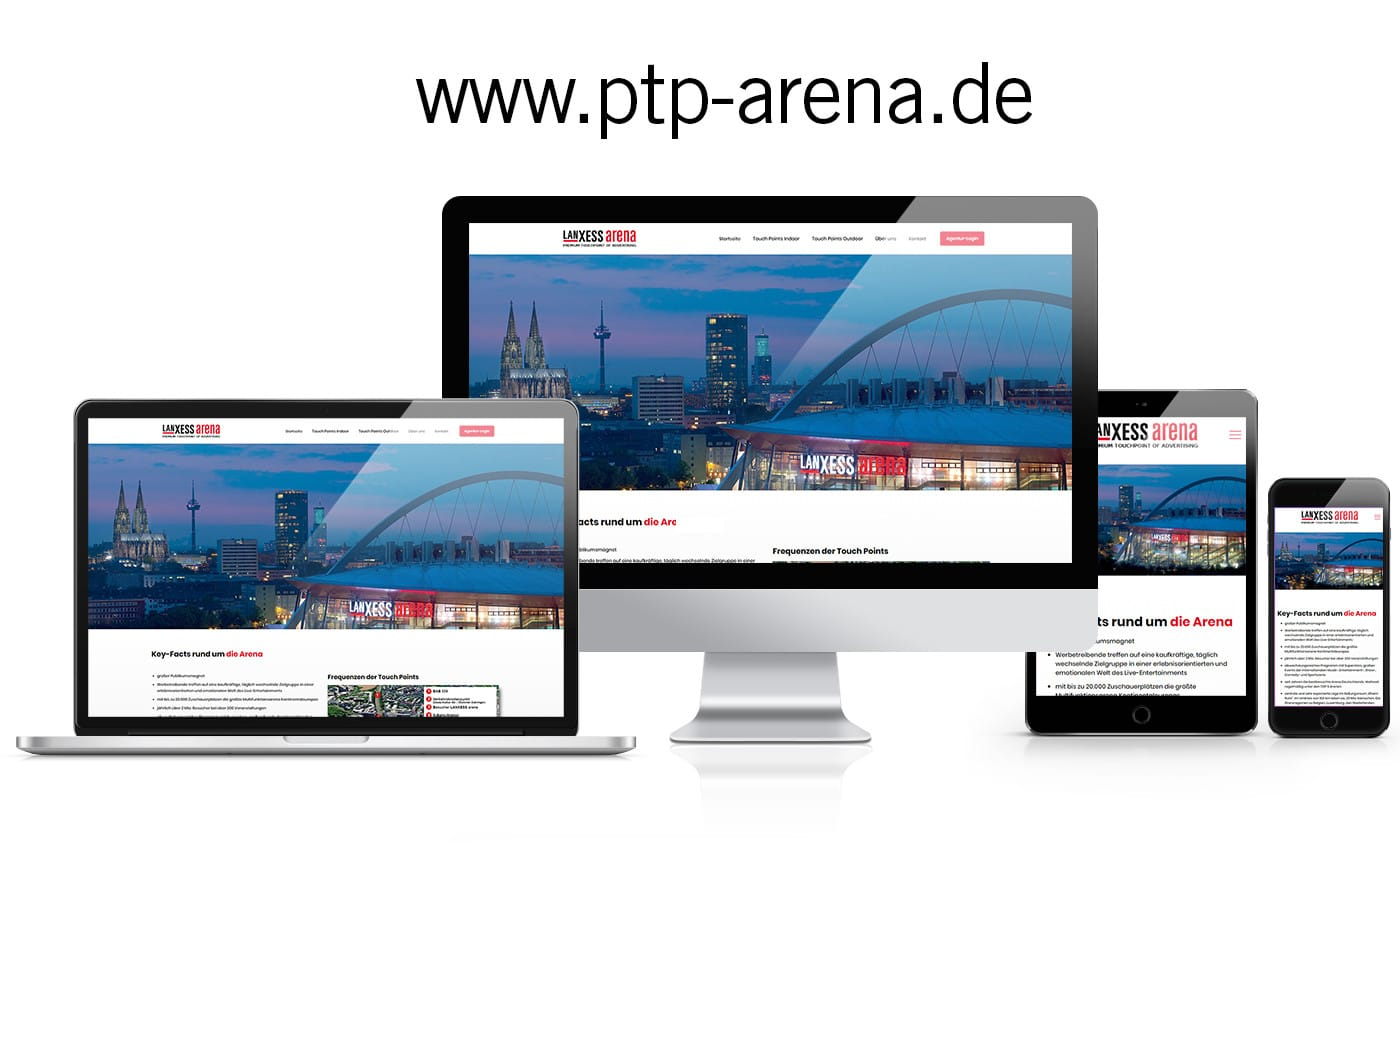 LANXESS arena - PTP-Arena